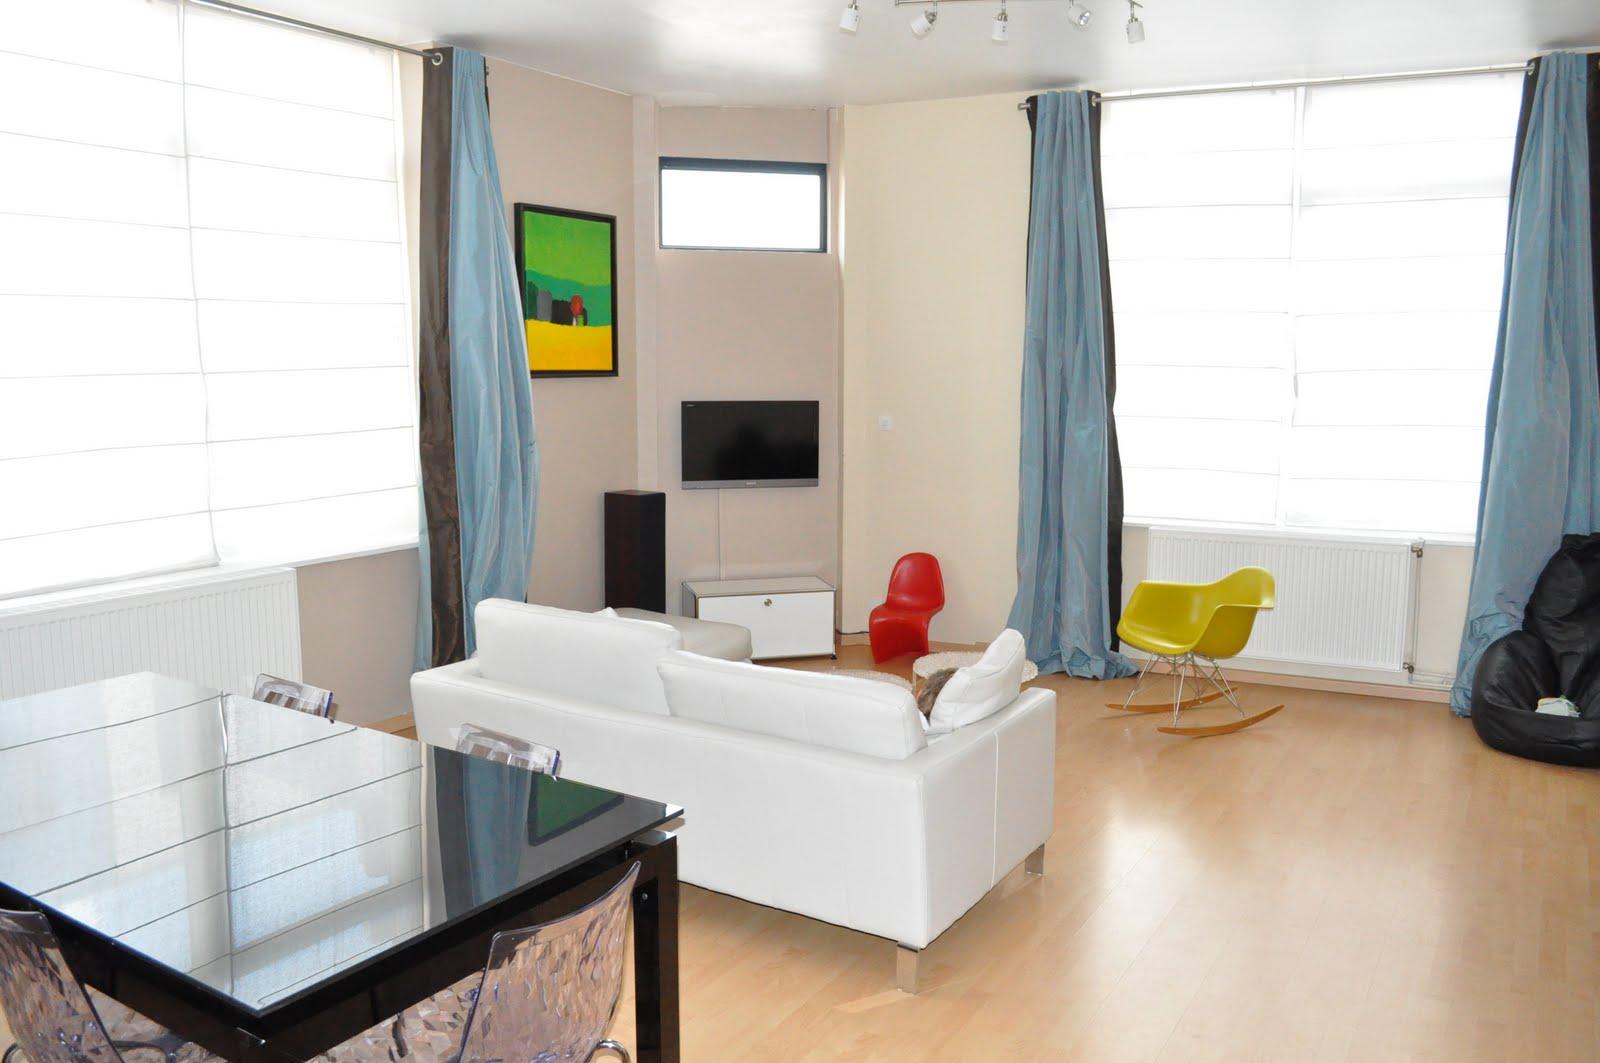 vente maison lille rdc. Black Bedroom Furniture Sets. Home Design Ideas